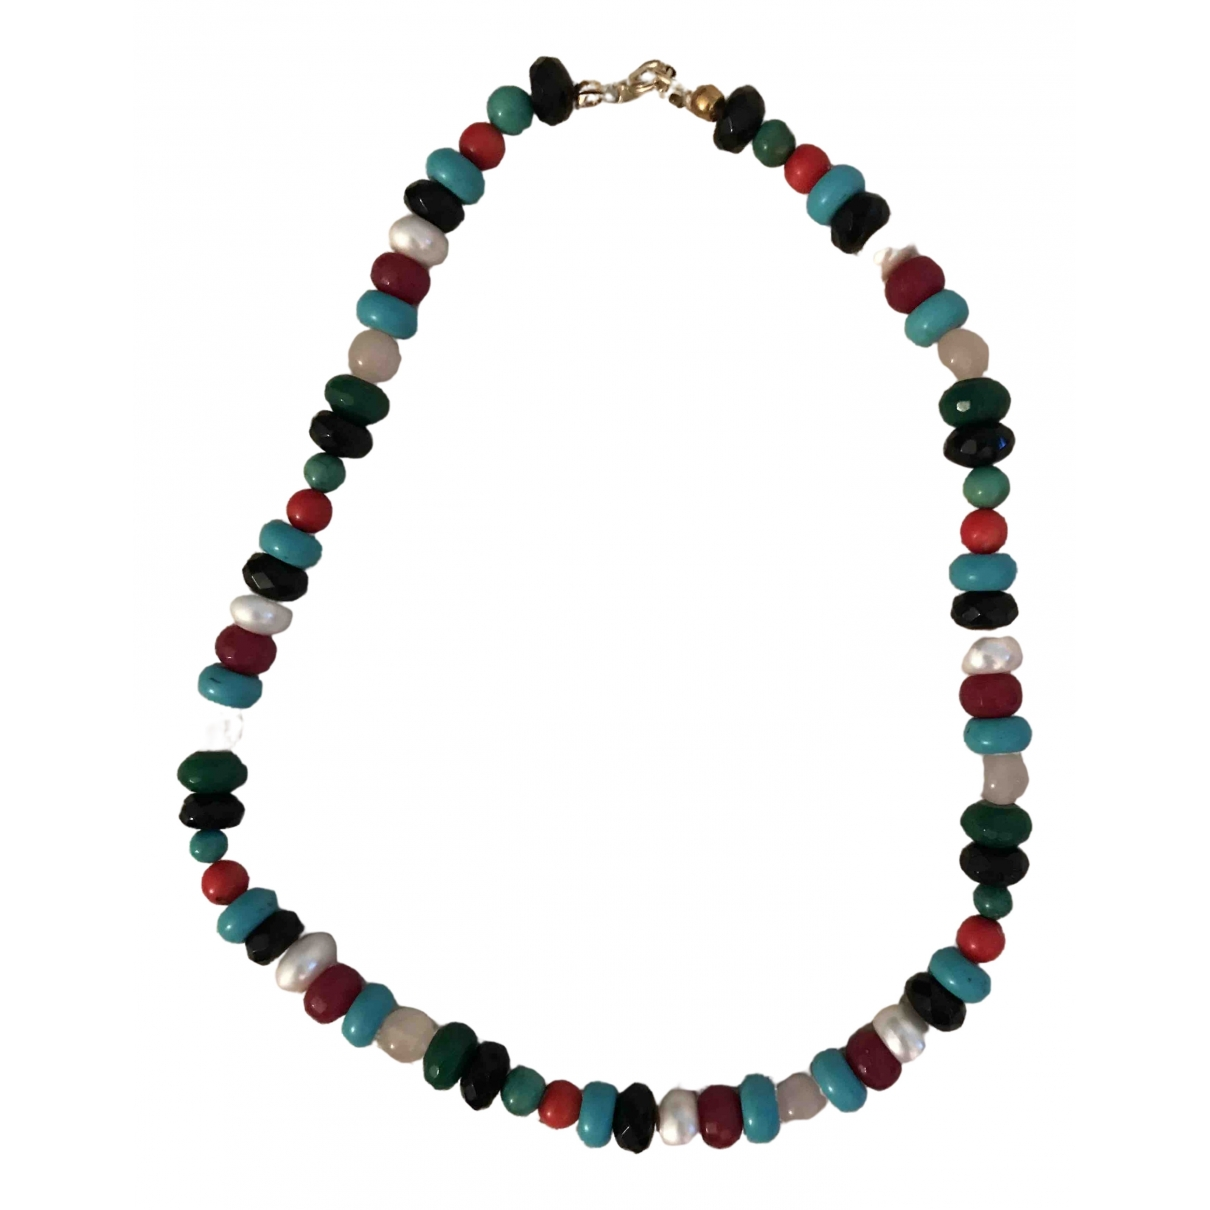 Non Signe / Unsigned Turquoises Kette in  Bunt Perlen